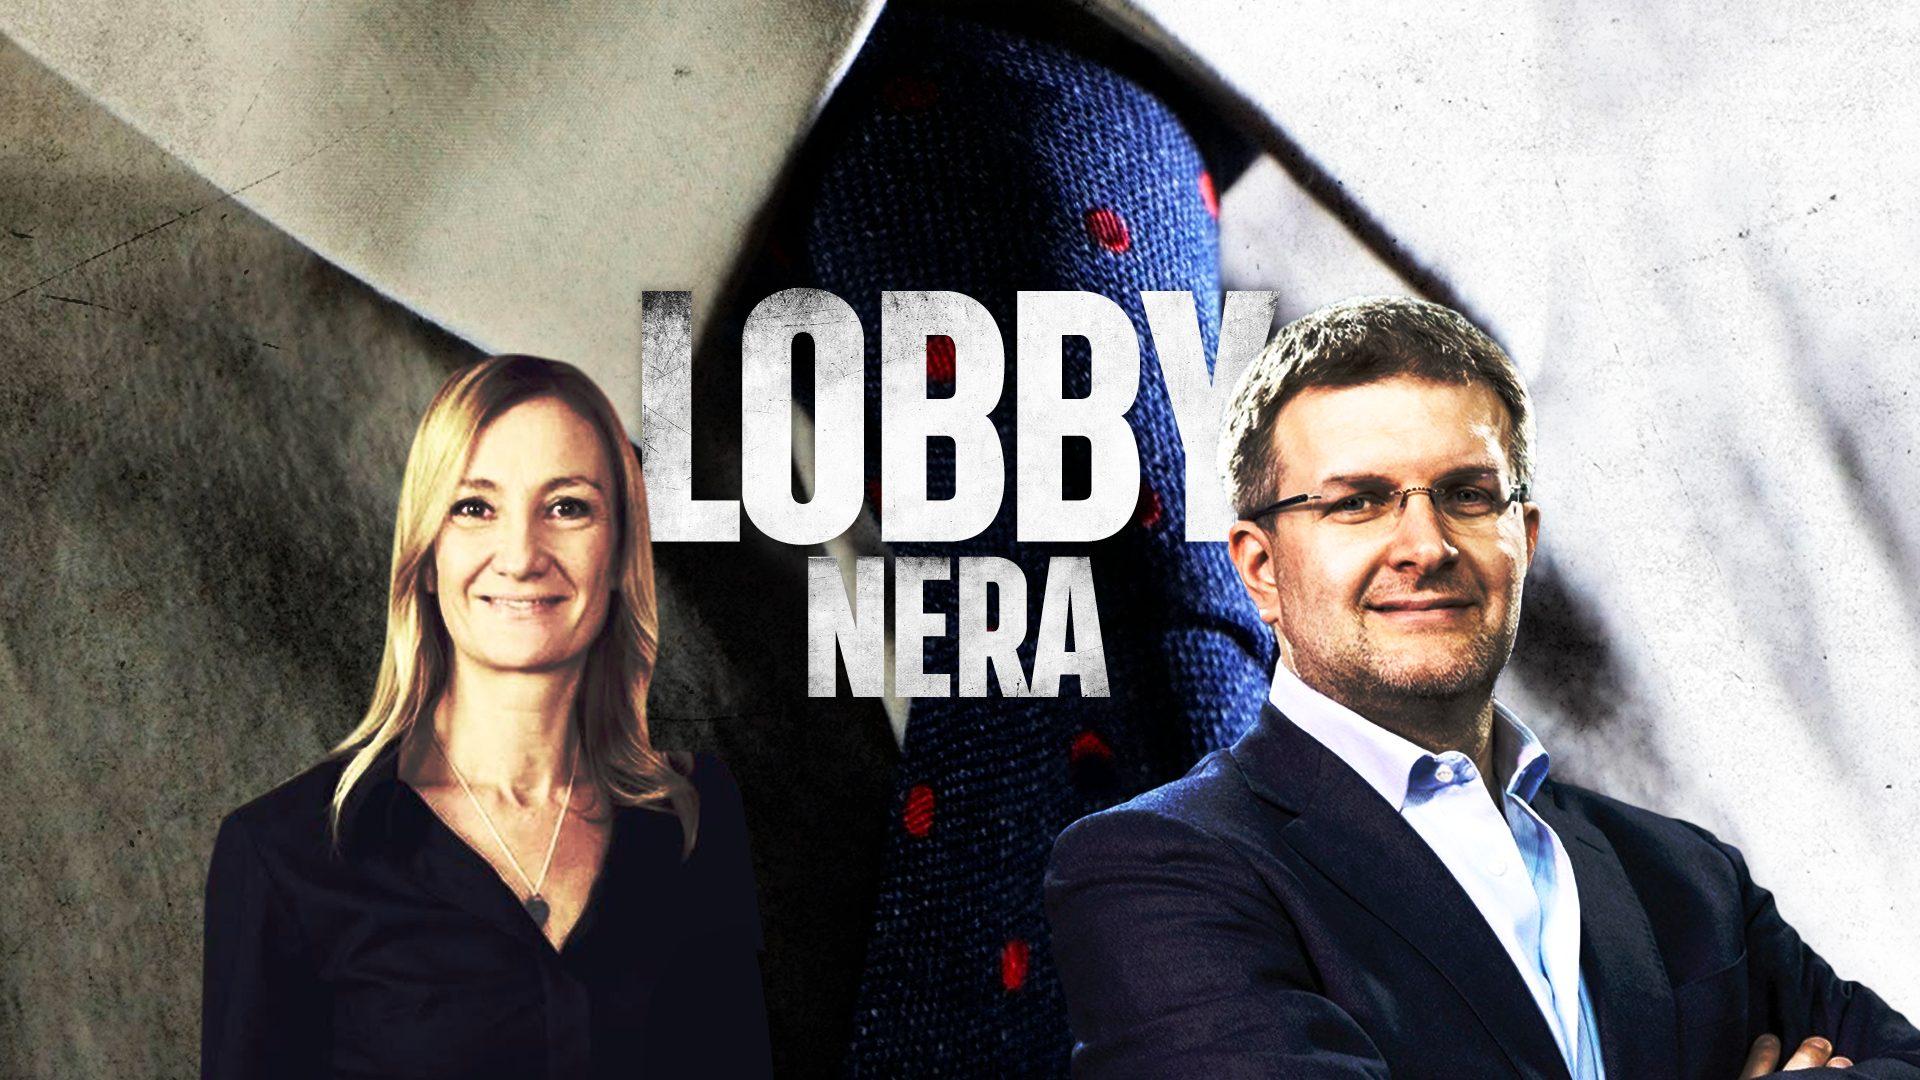 Lobby Nera: inchiesta sulla destra neofascista